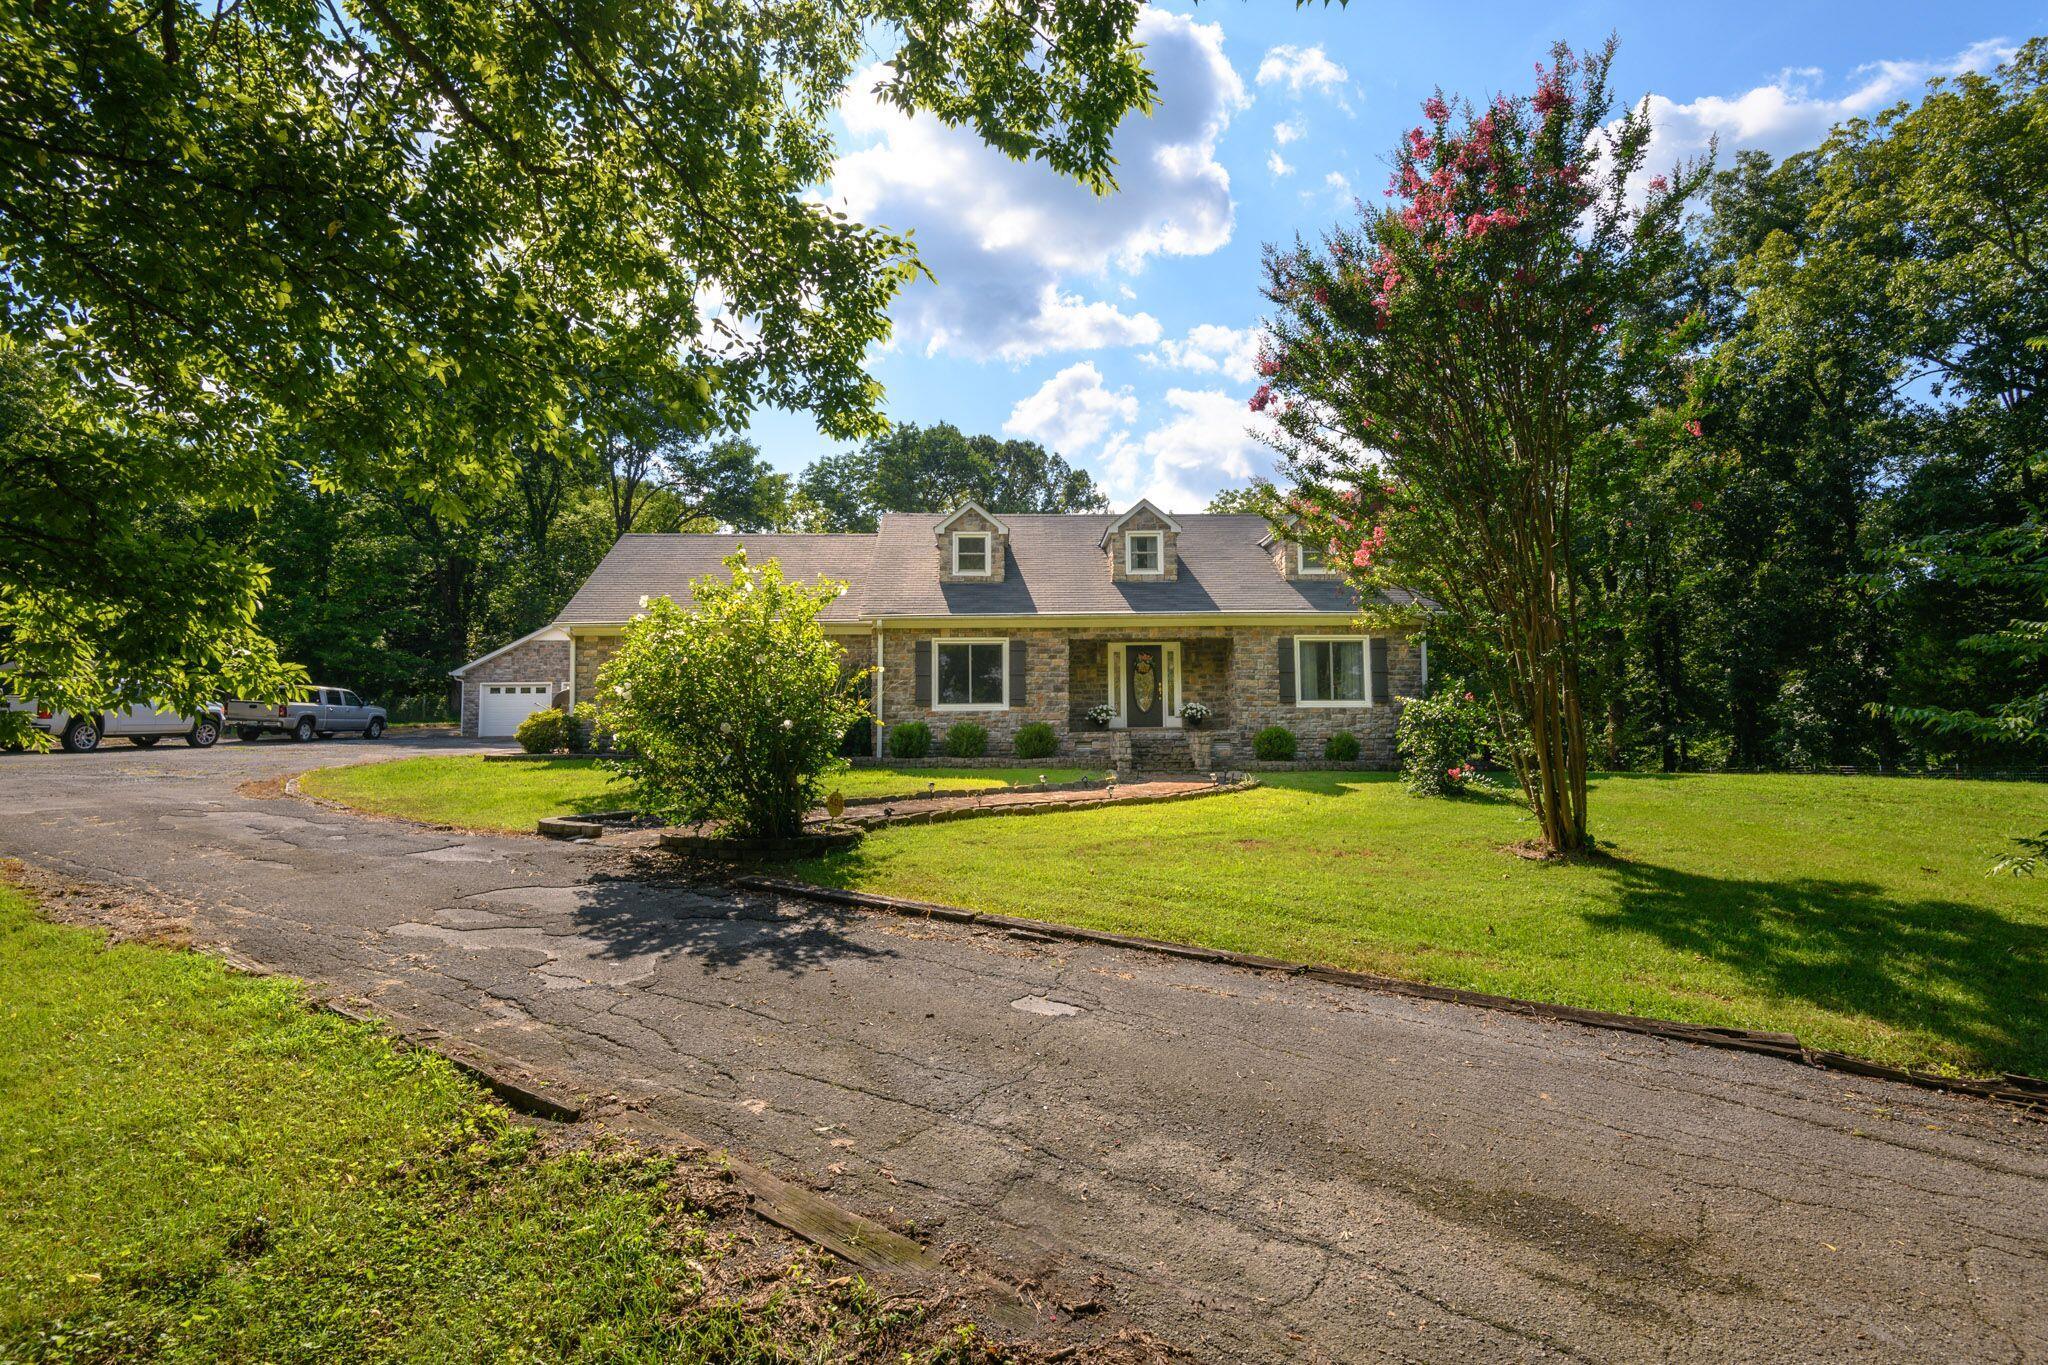 1426 Highway 130 West, Shelbyville, TN 37160 - Shelbyville, TN real estate listing